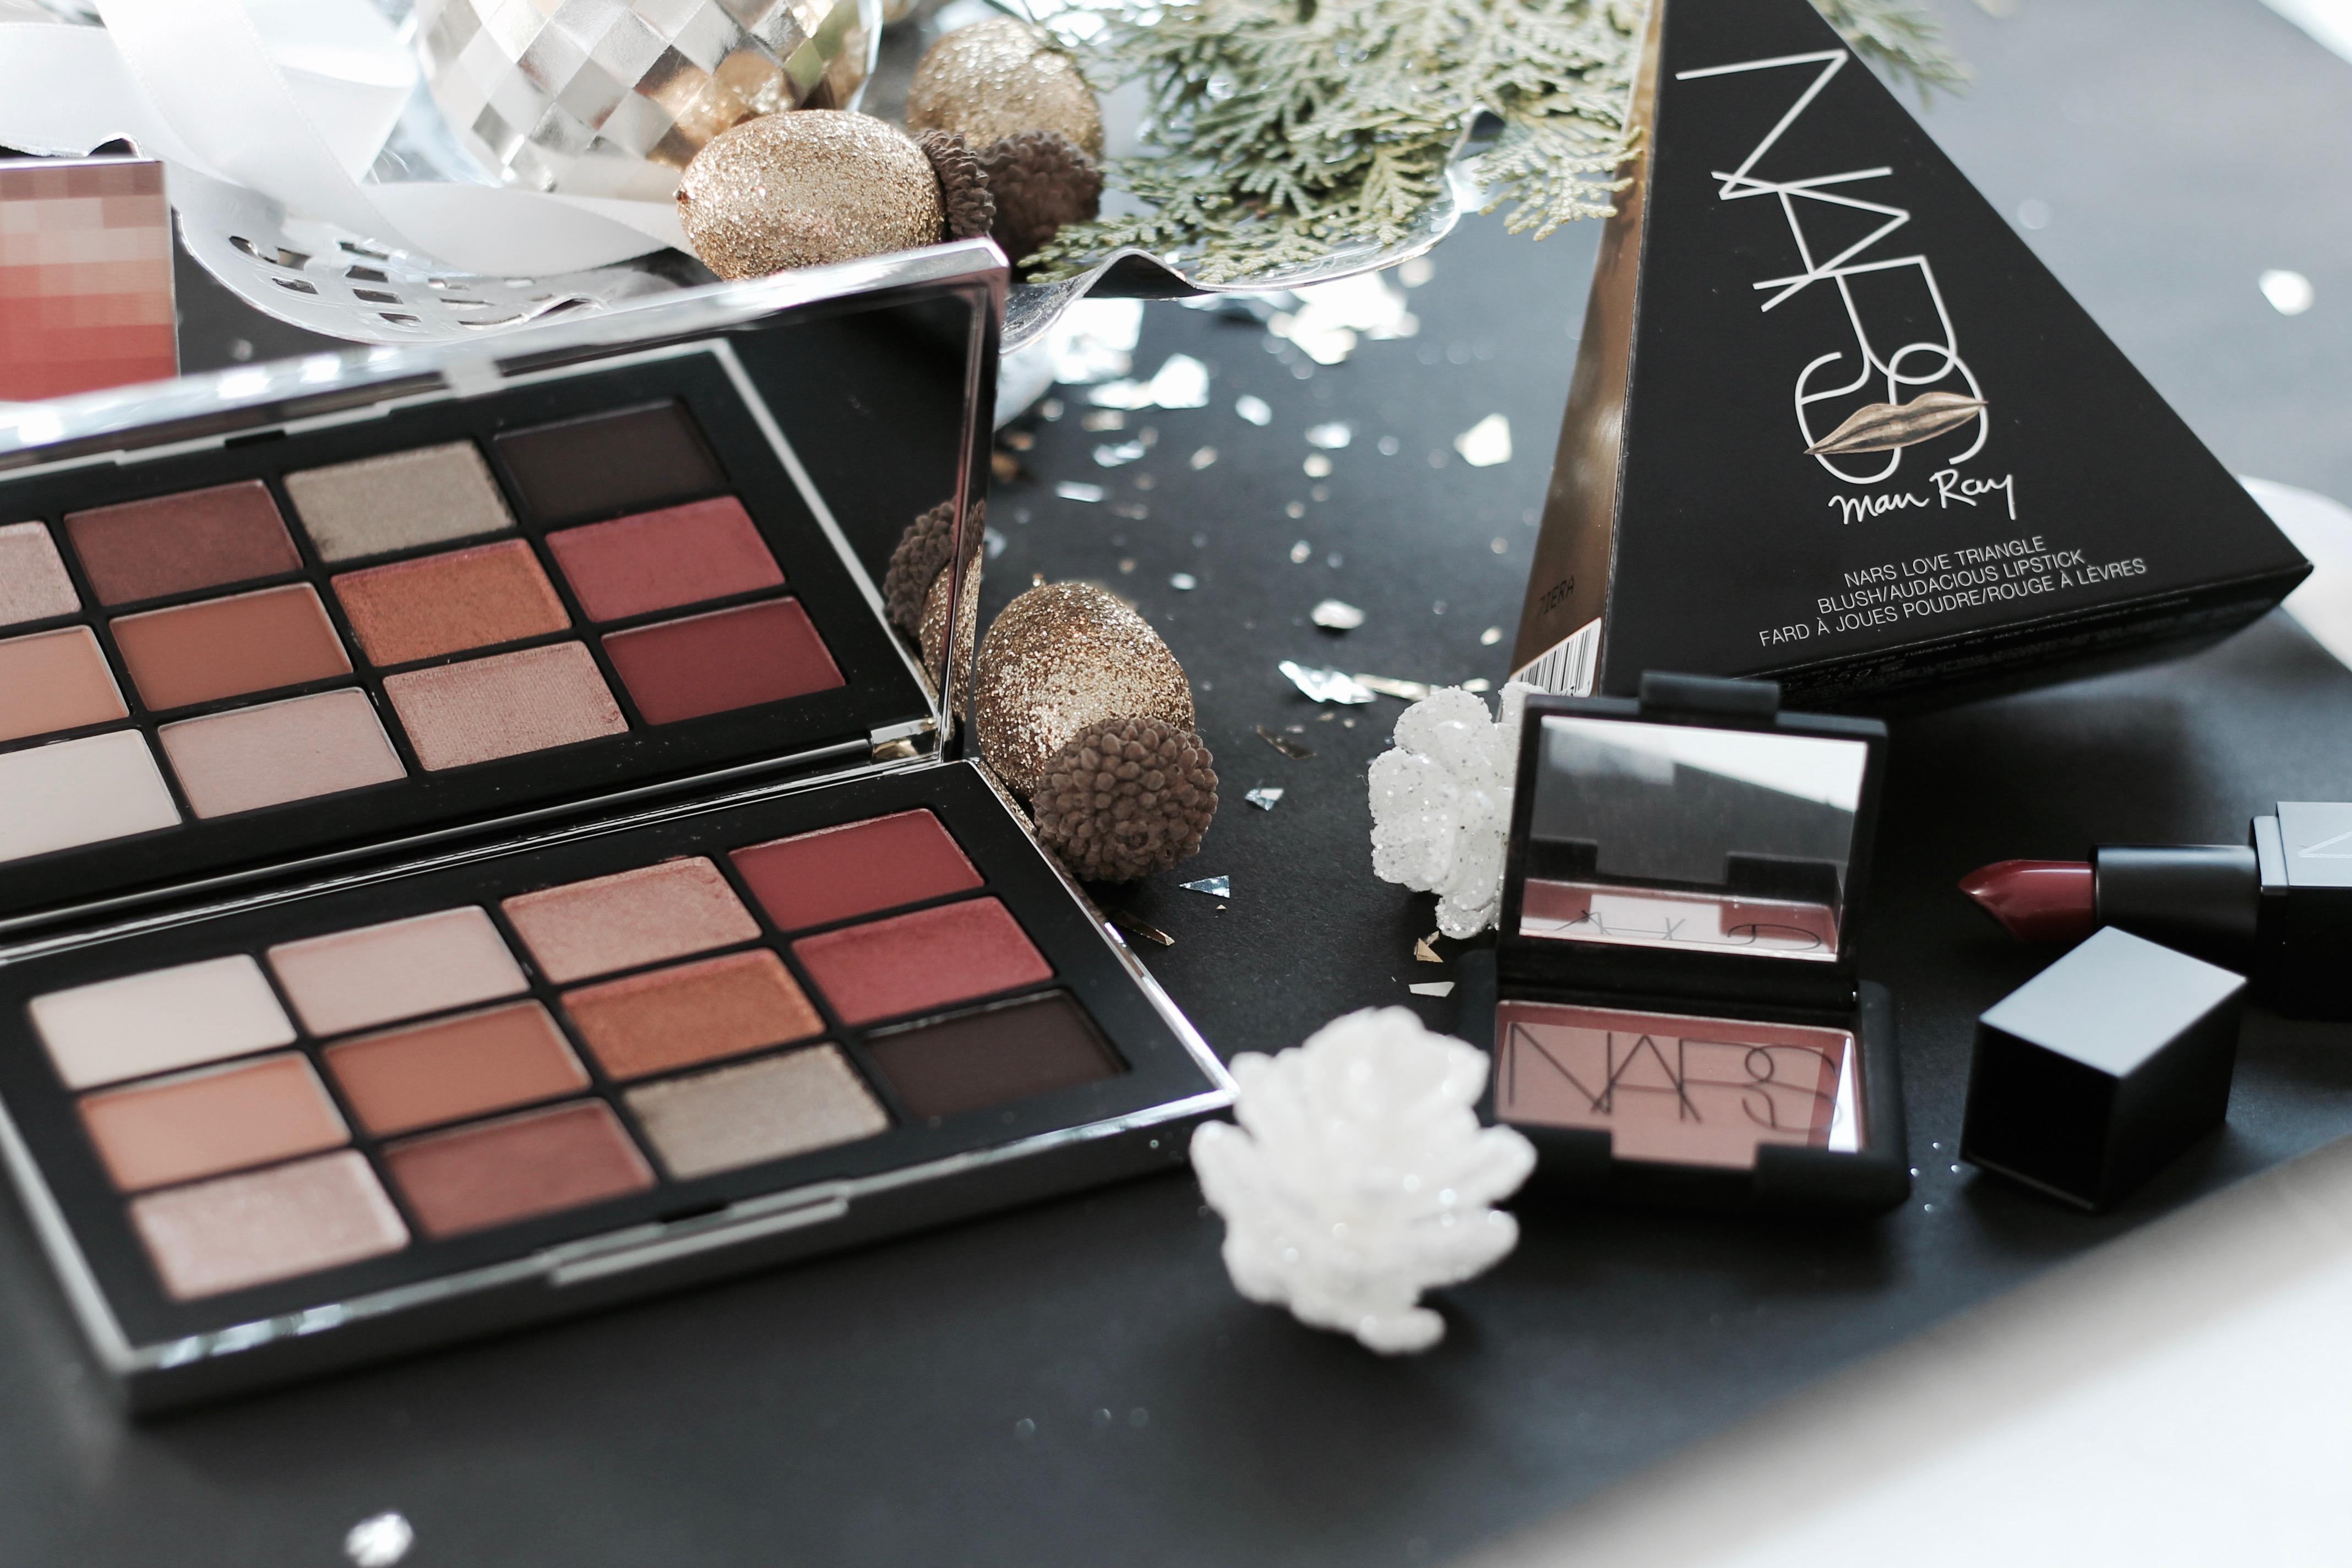 MON MODE Blog | Mon Mode | Fashion Blog | Toronto Blogger | Gift Guide Beauty Lover | Nars Wanted Palette